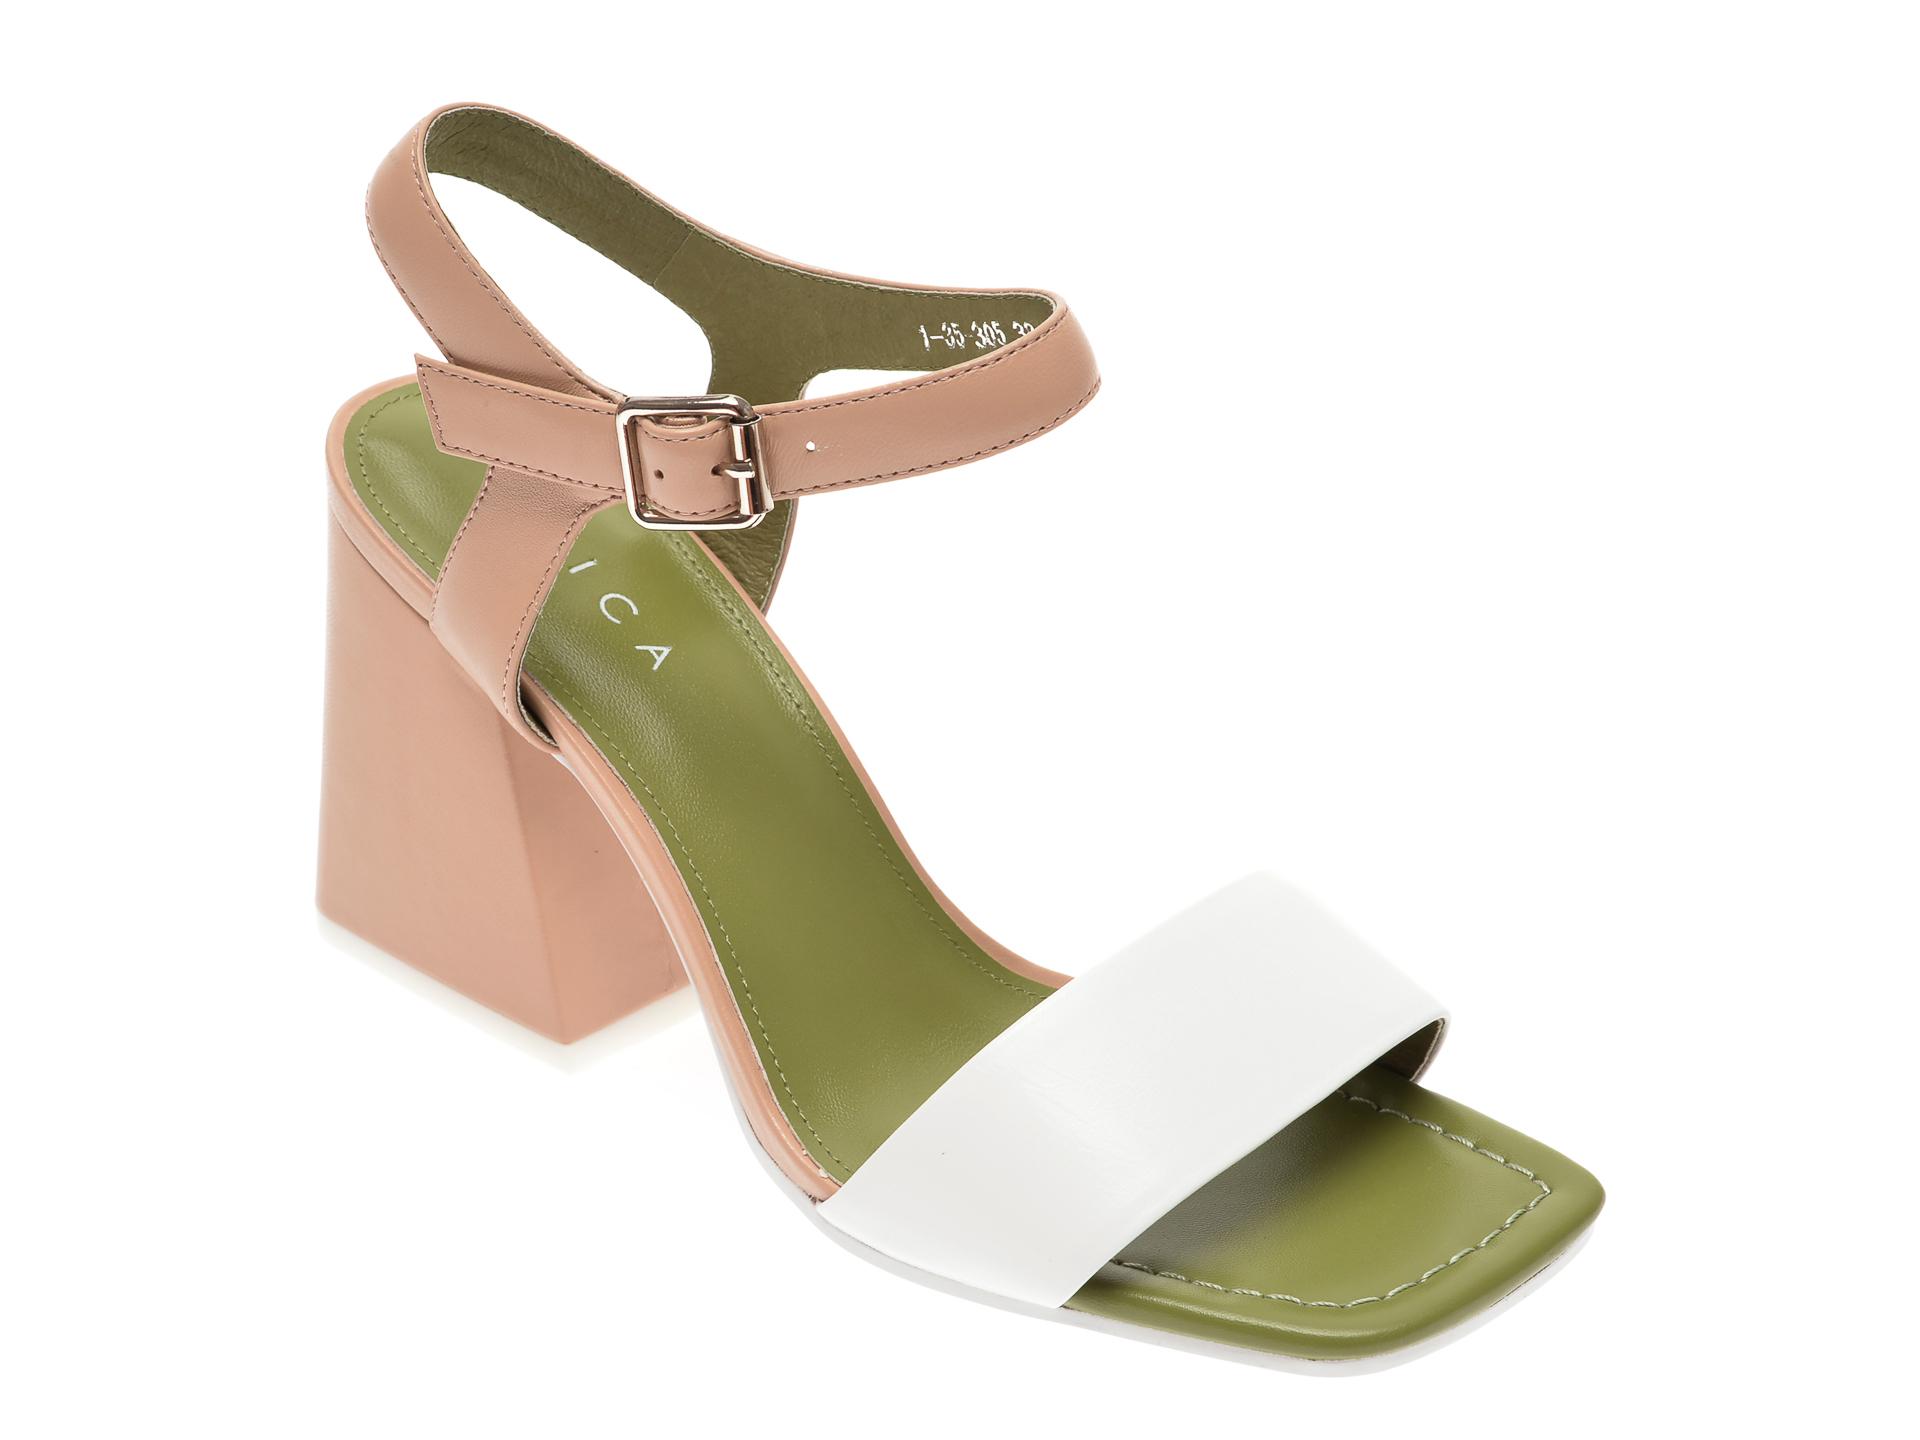 Sandale EPICA bej, 13530, din piele naturala